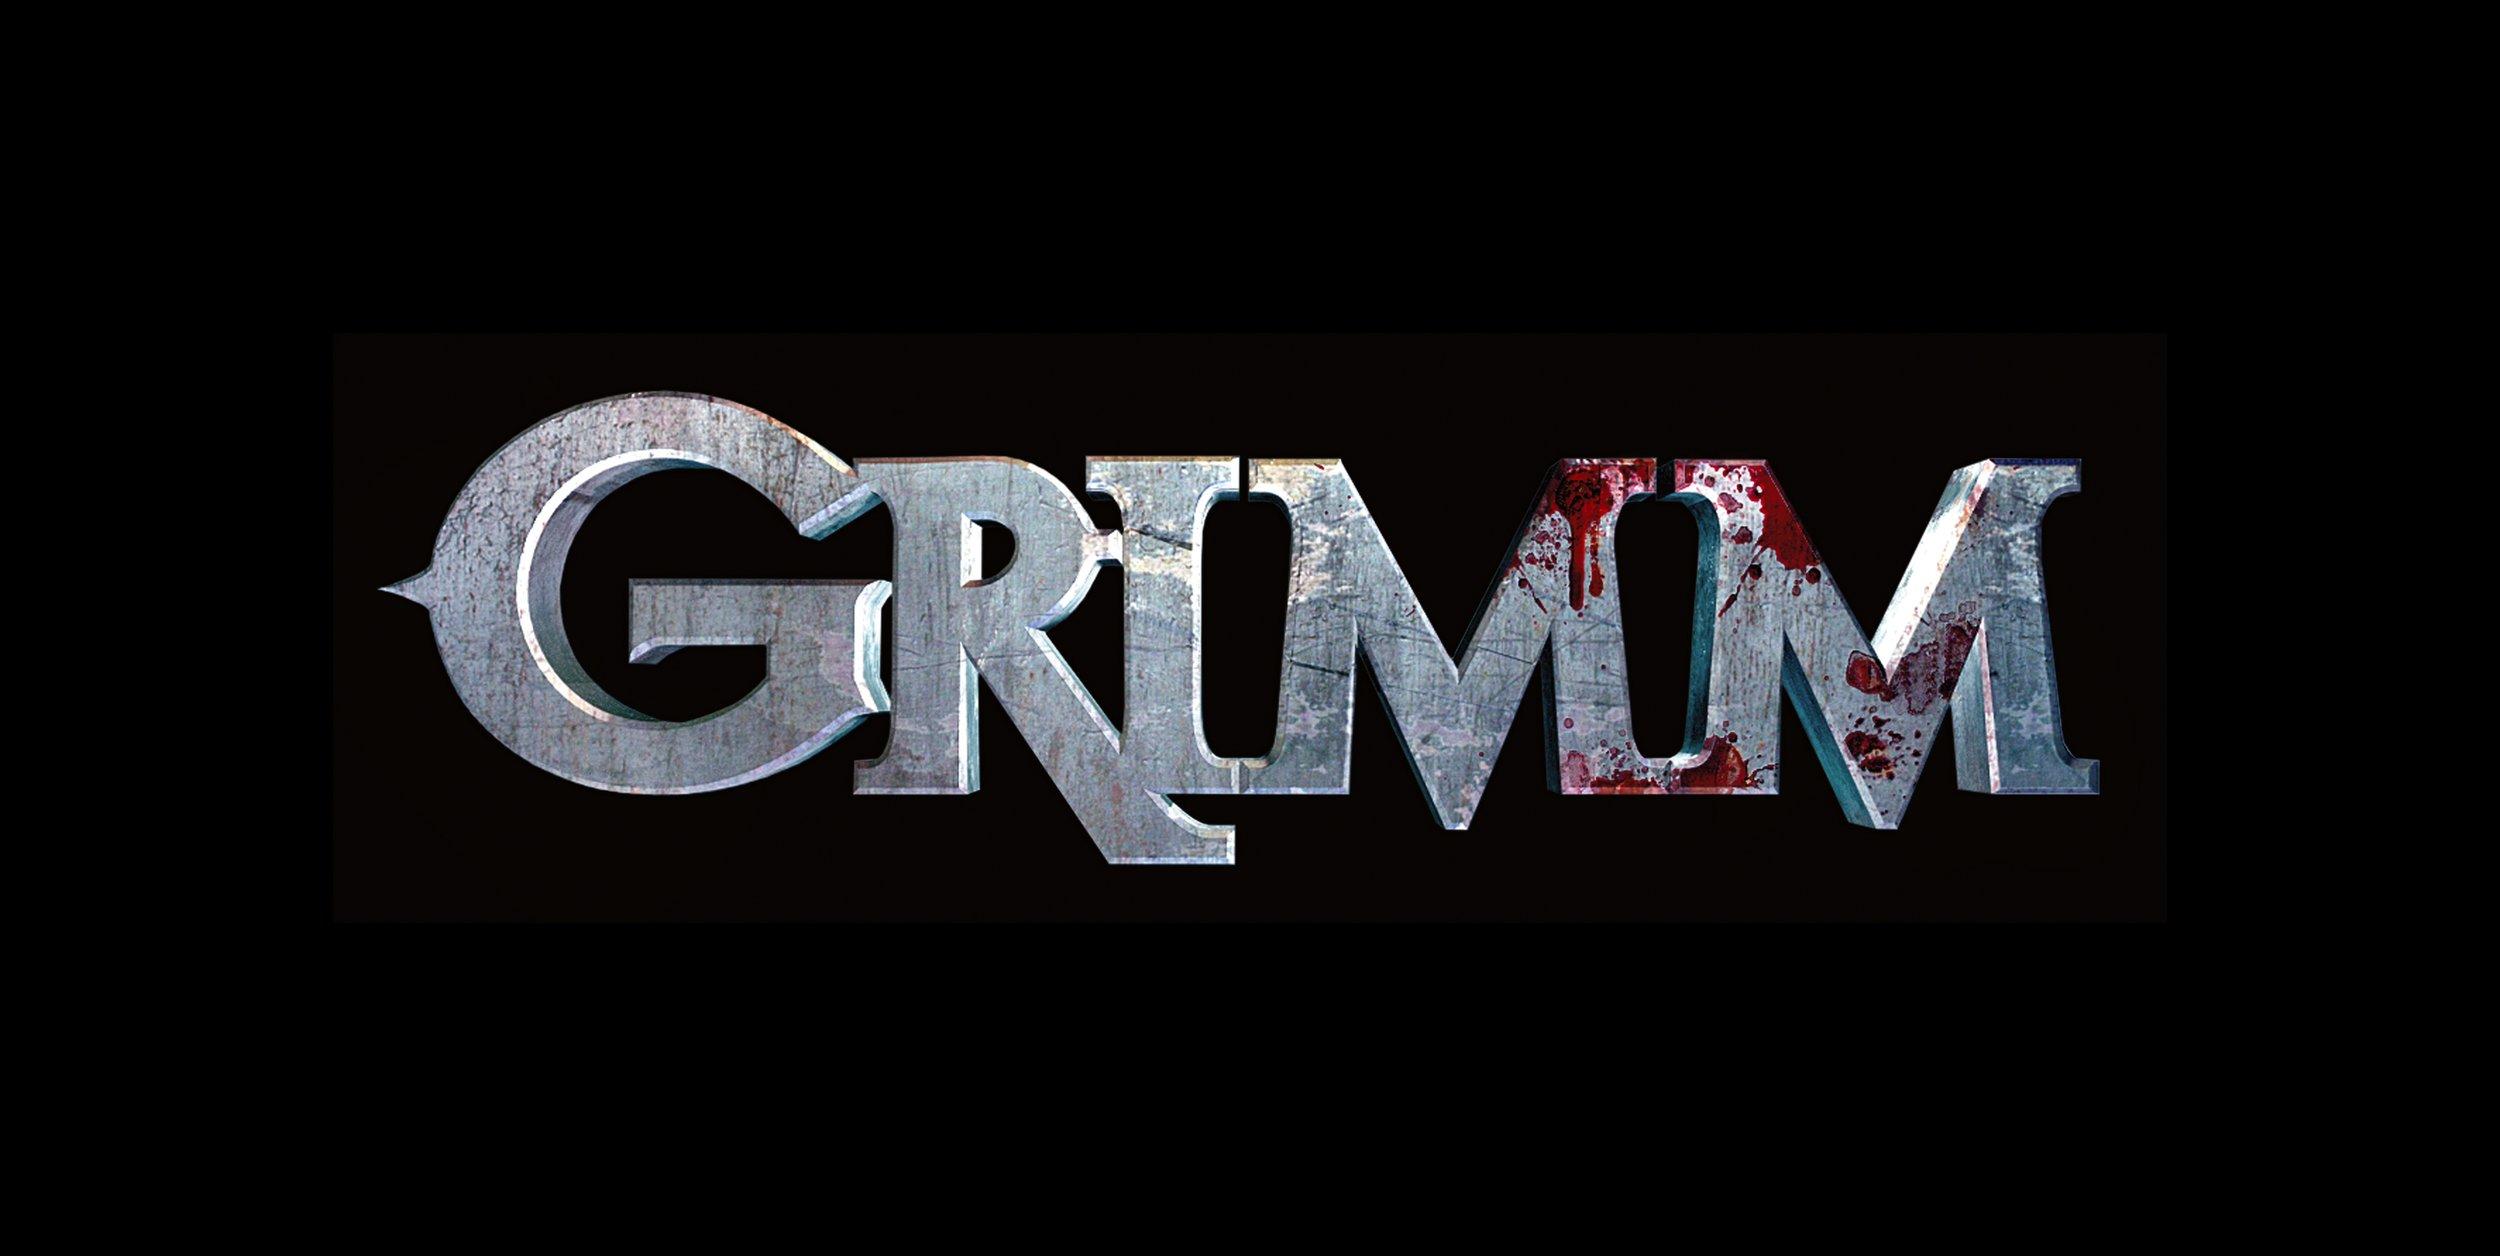 GRIMM  Arri Alexa Classic / Alexa Mini  Zeiss Ultra Primes / Angénieux Optimos